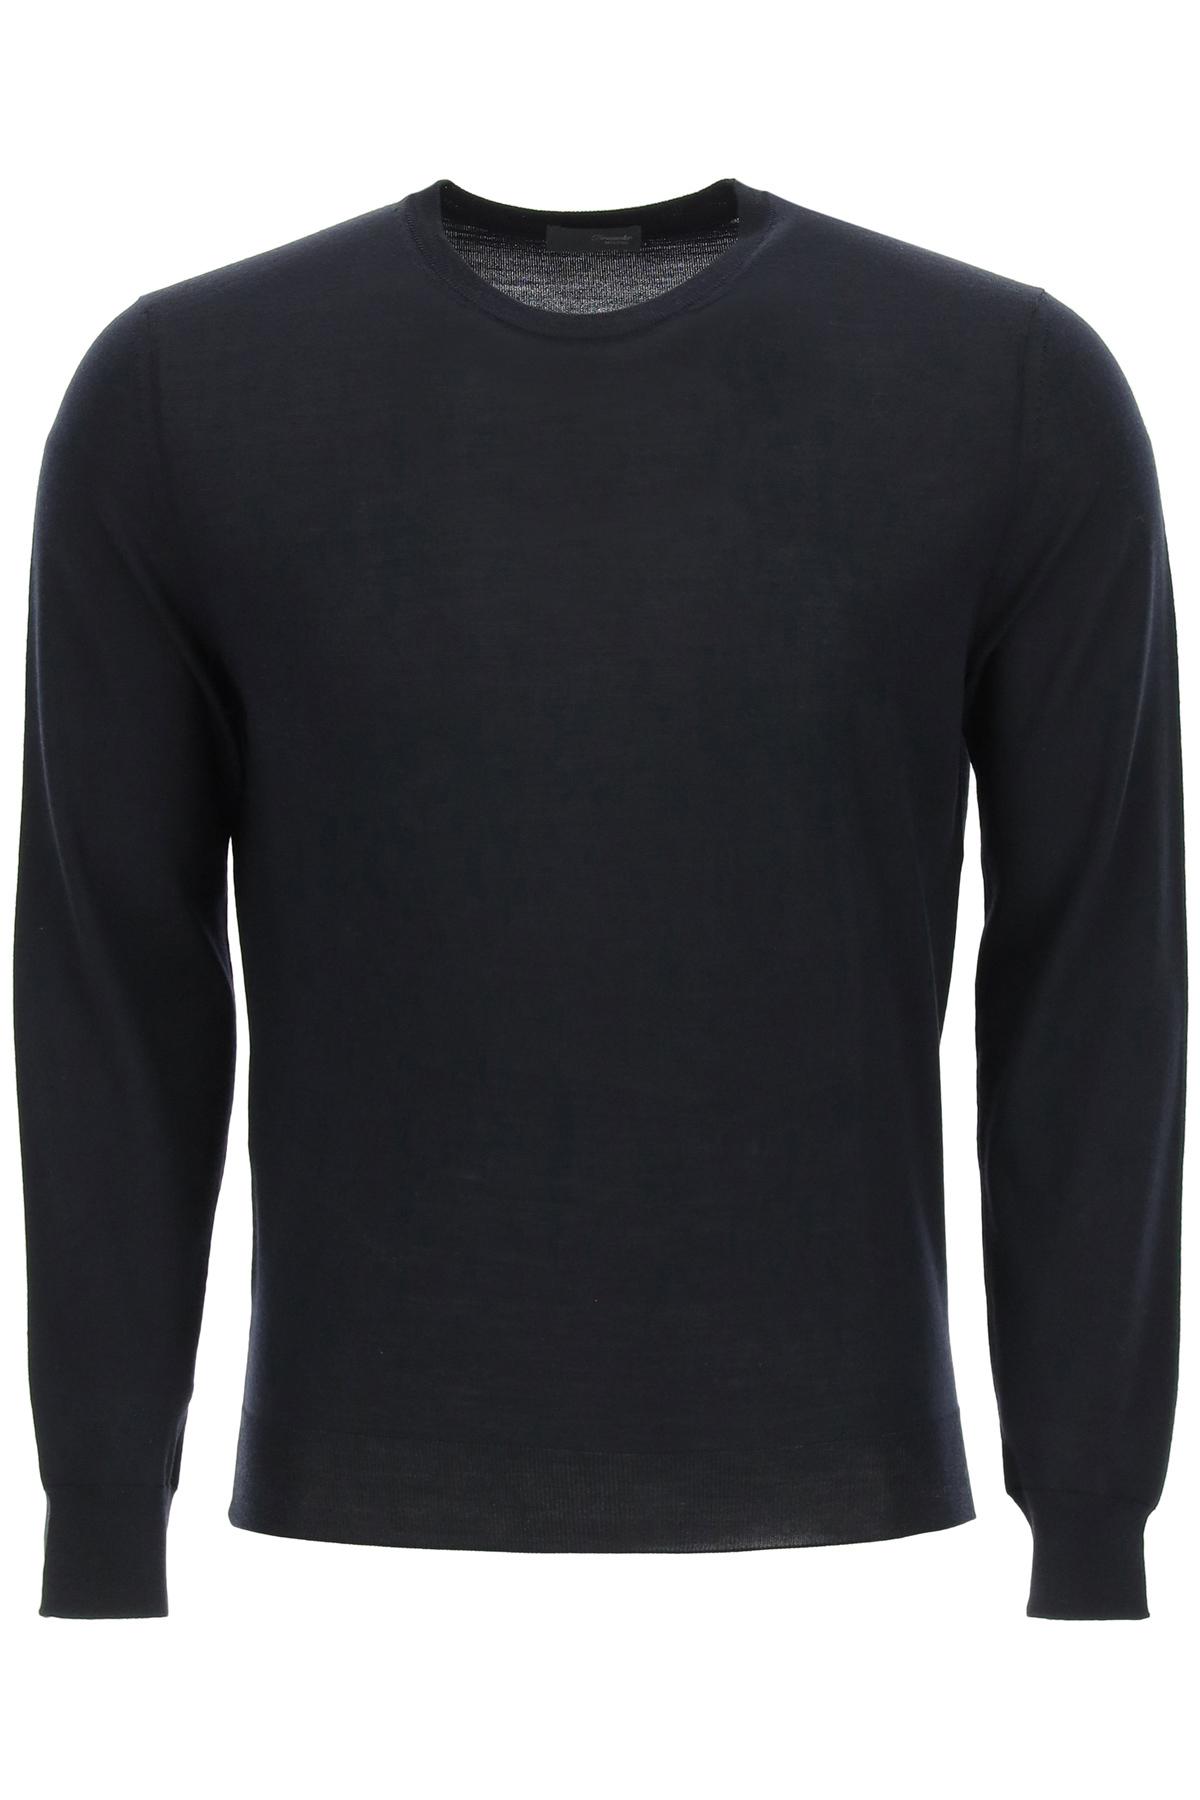 Drumohr maglia in lana merino superfine